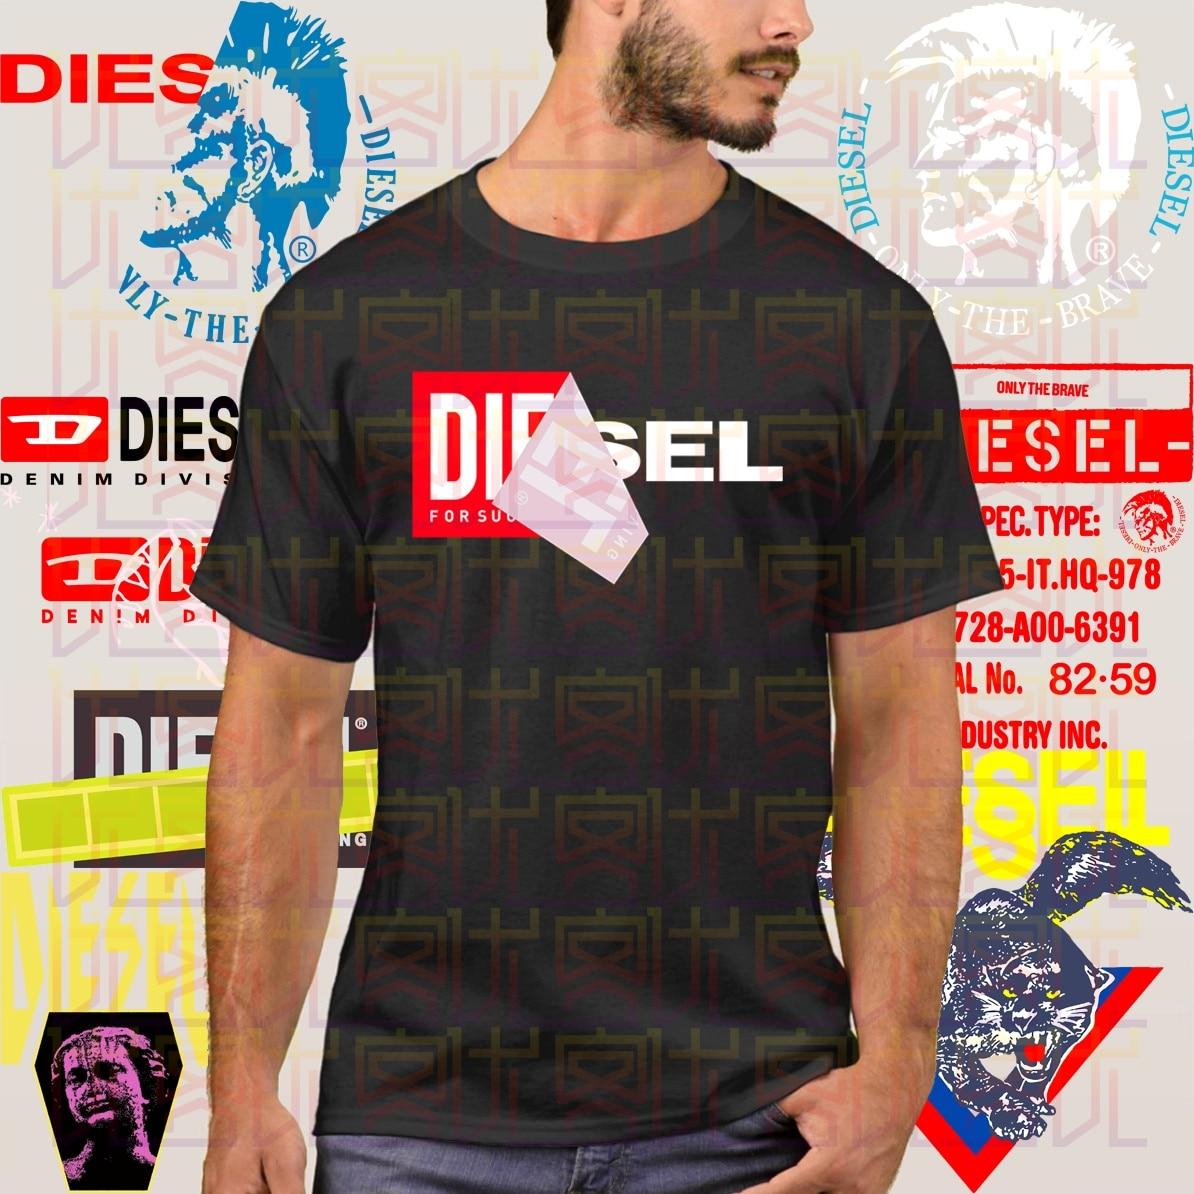 Diesel T-Diego QA T-Shirt Classic Style T-shirt Winner Tee Men Brand Clothing Clothes Popular T-Shirt Crewneck Cotton Cool Tees